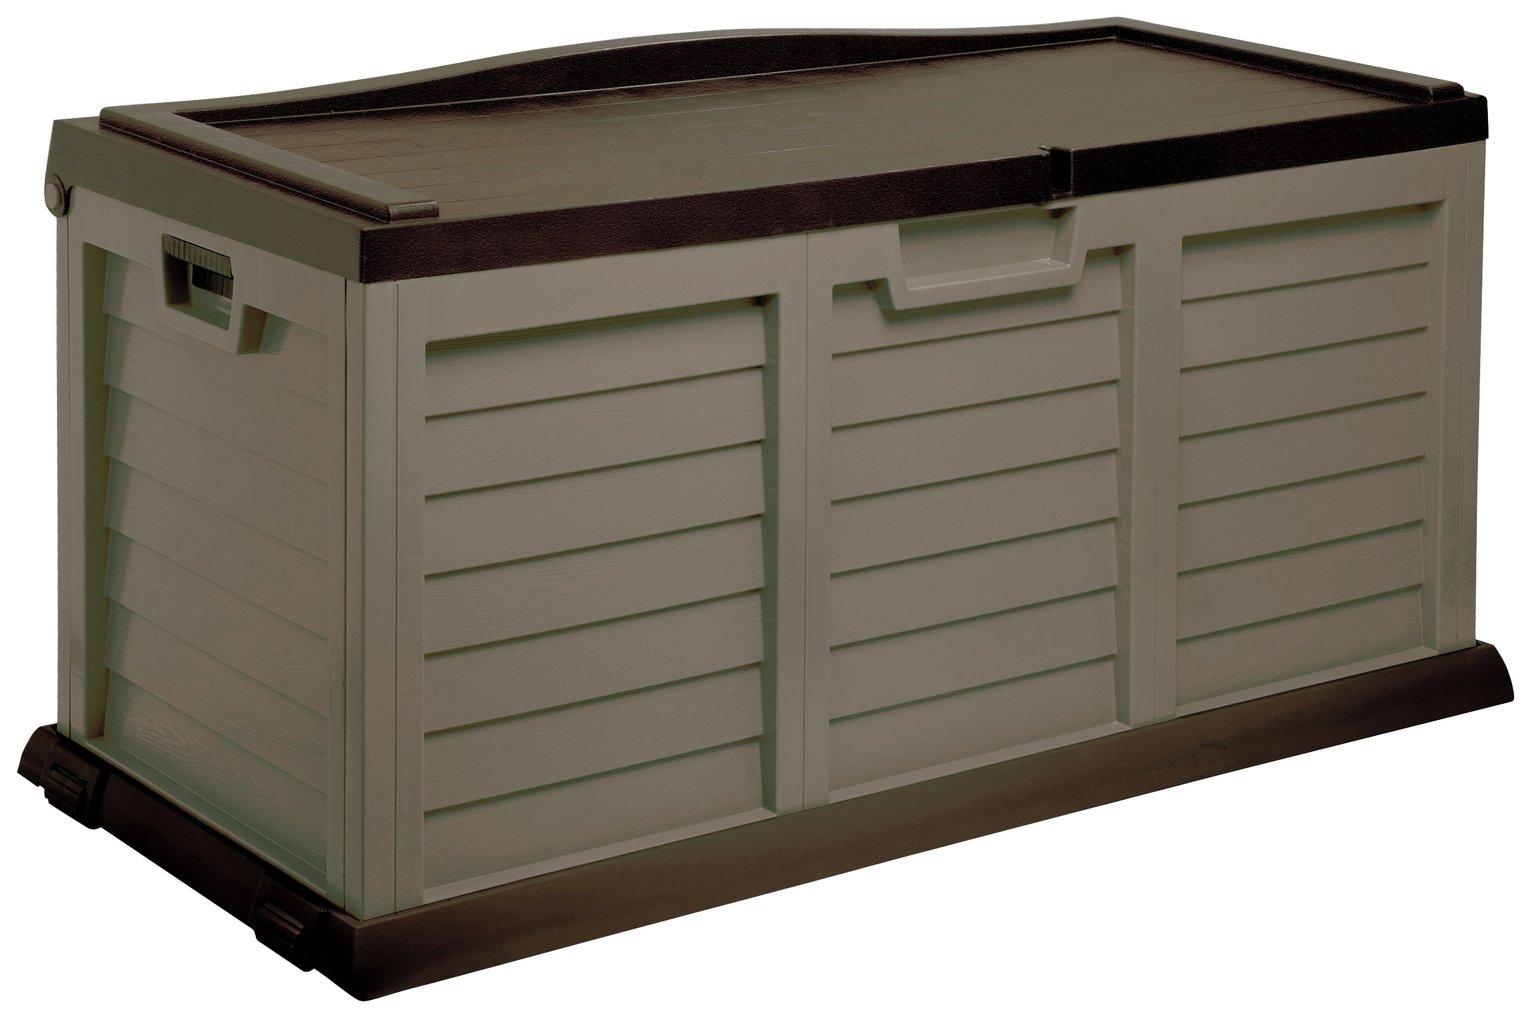 McGregor 440L Storage Box - Mocha